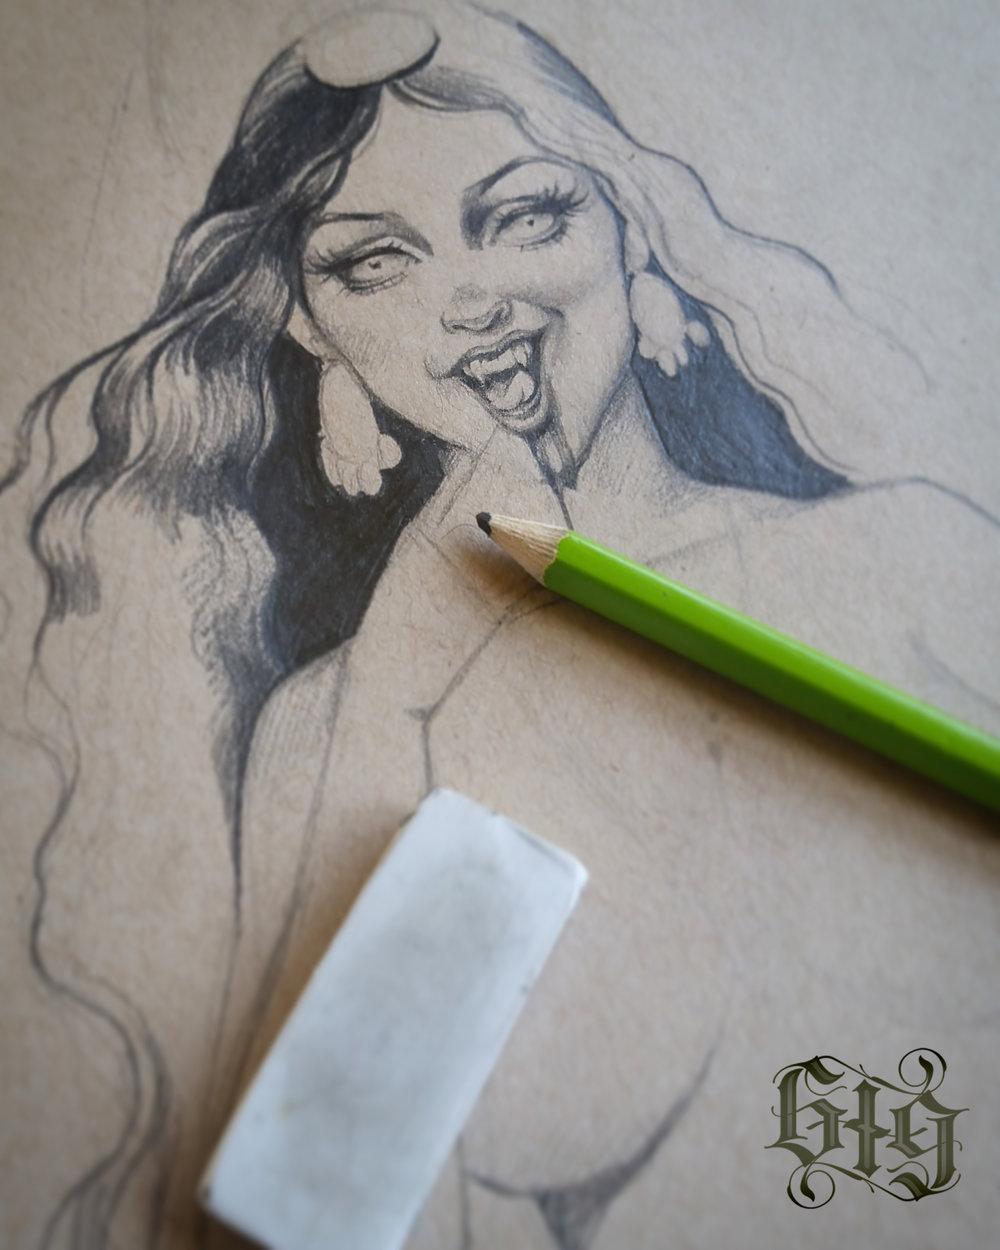 Vampires in fine detail pencil. Original artwork